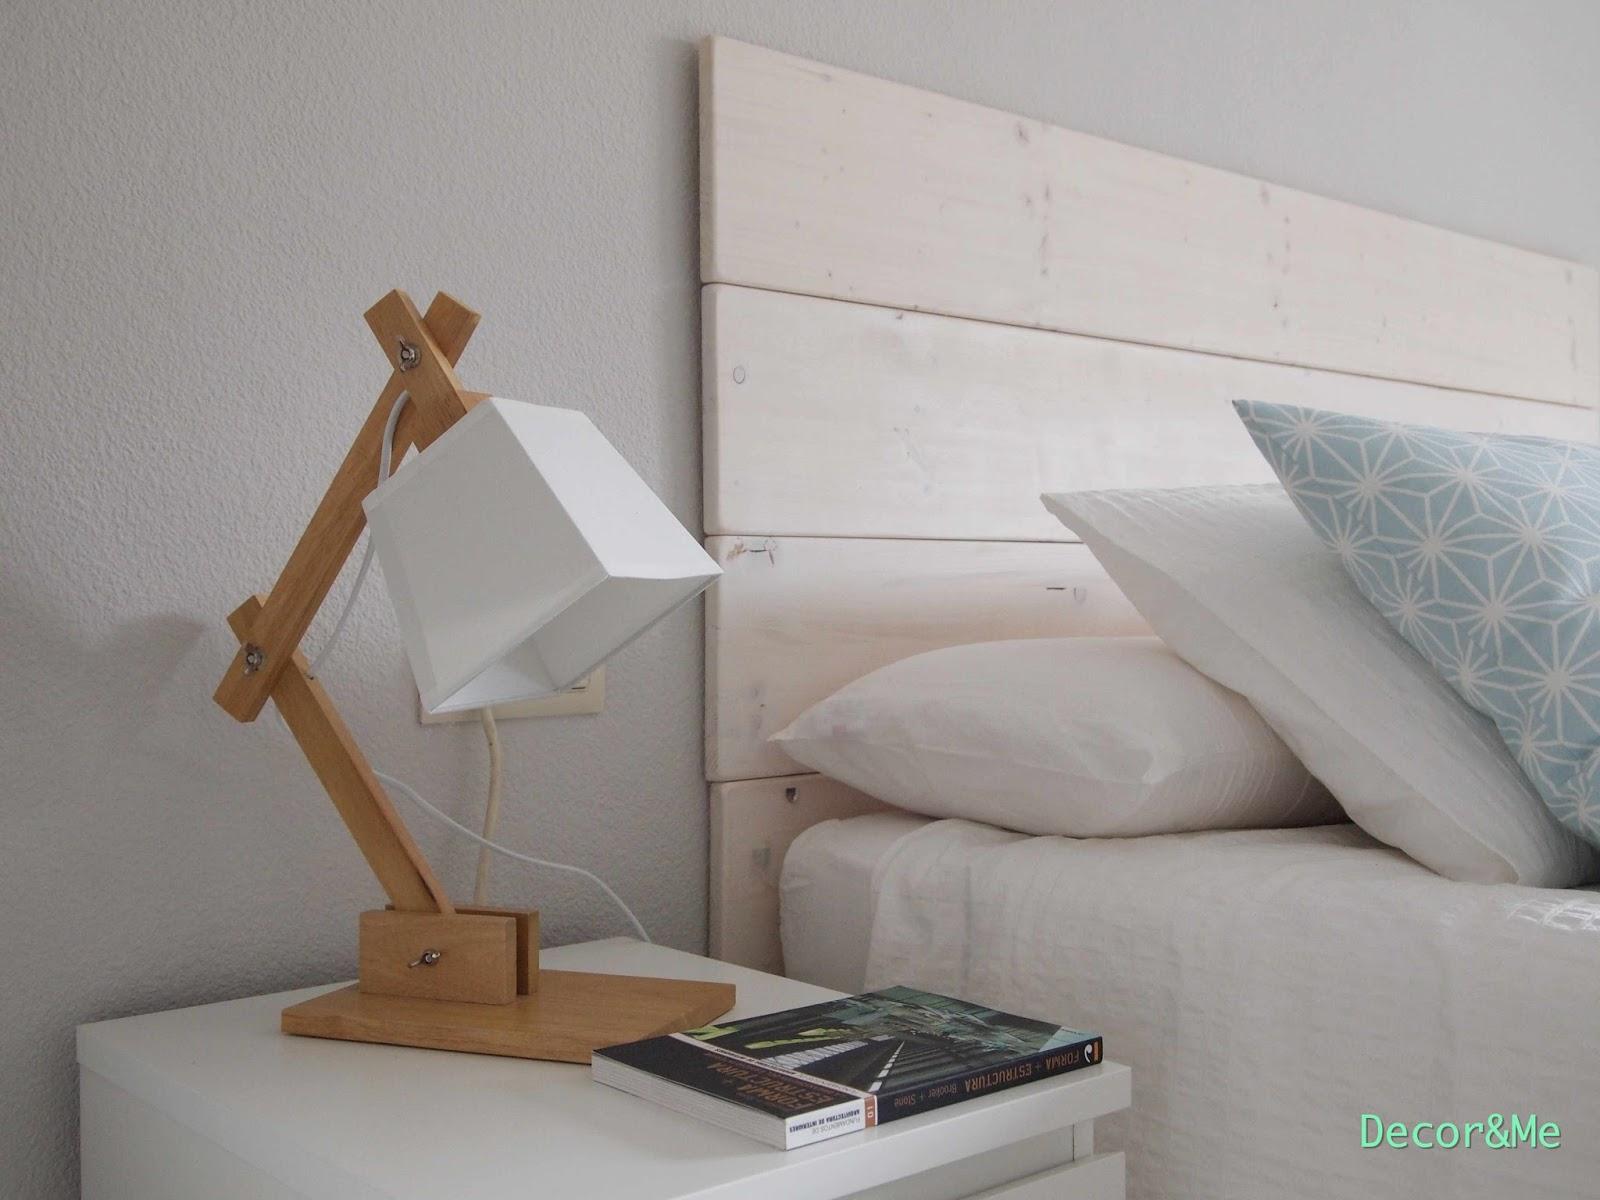 Decor me antes despu s mi dormitorio - Tablon madera leroy merlin ...